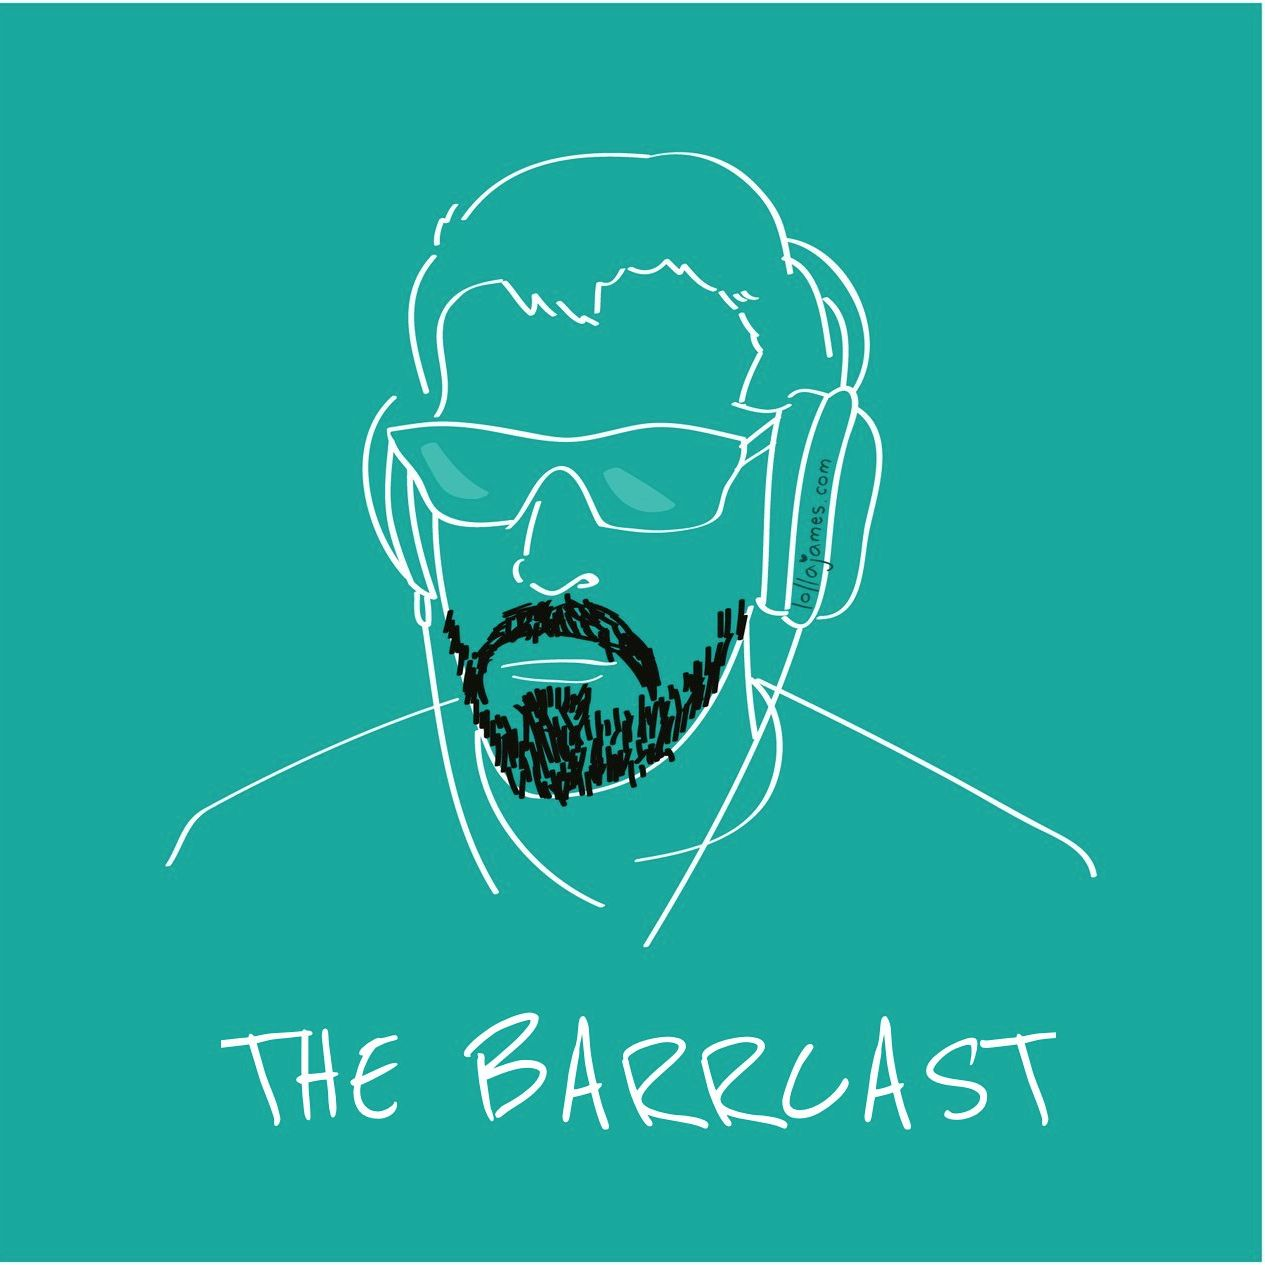 Barrcast